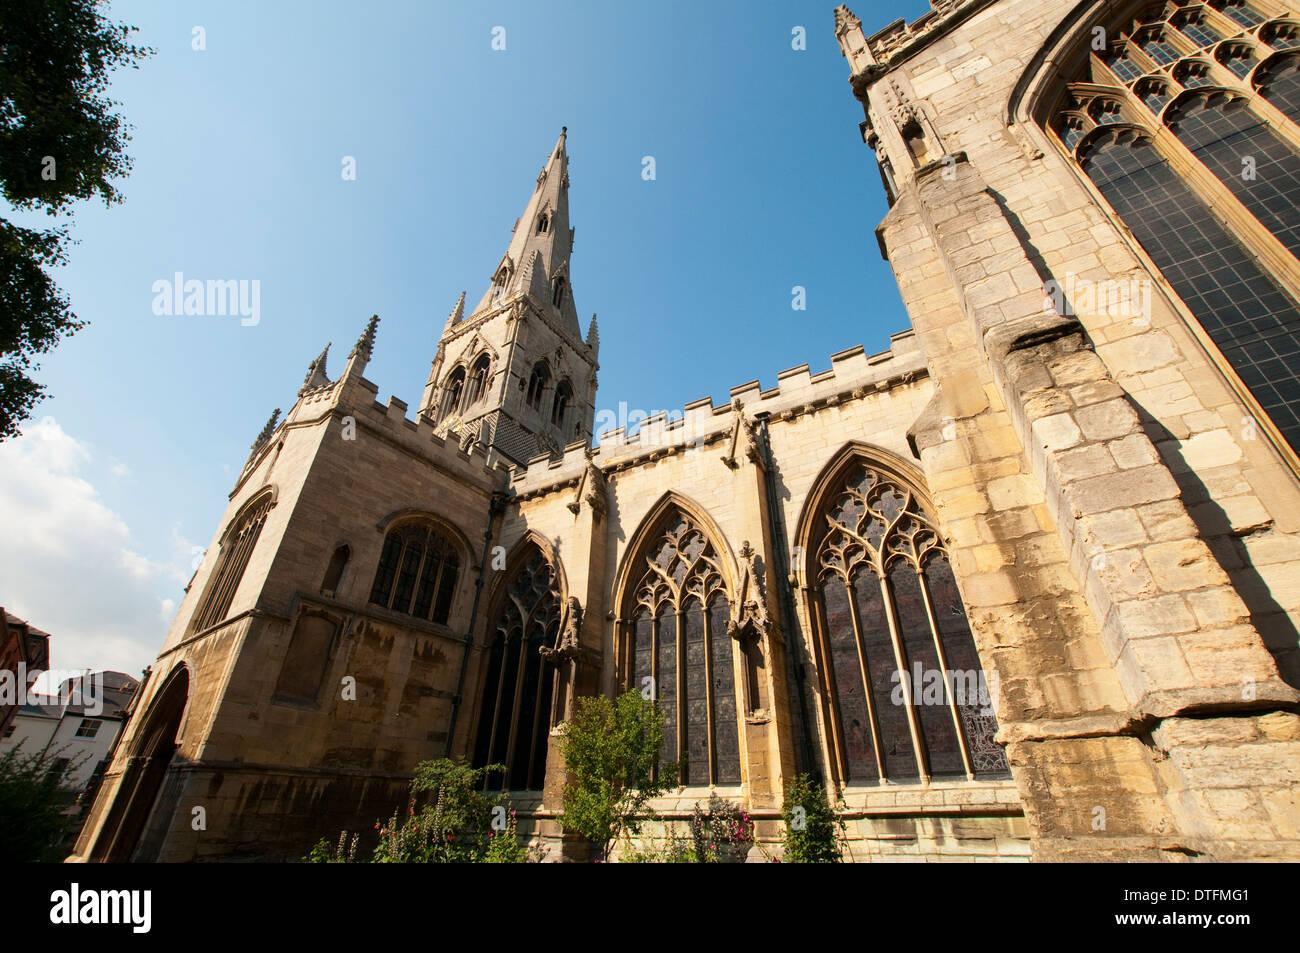 The Church of St Mary Magdalene in Newark, Nottinghamshire England UK - Stock Image